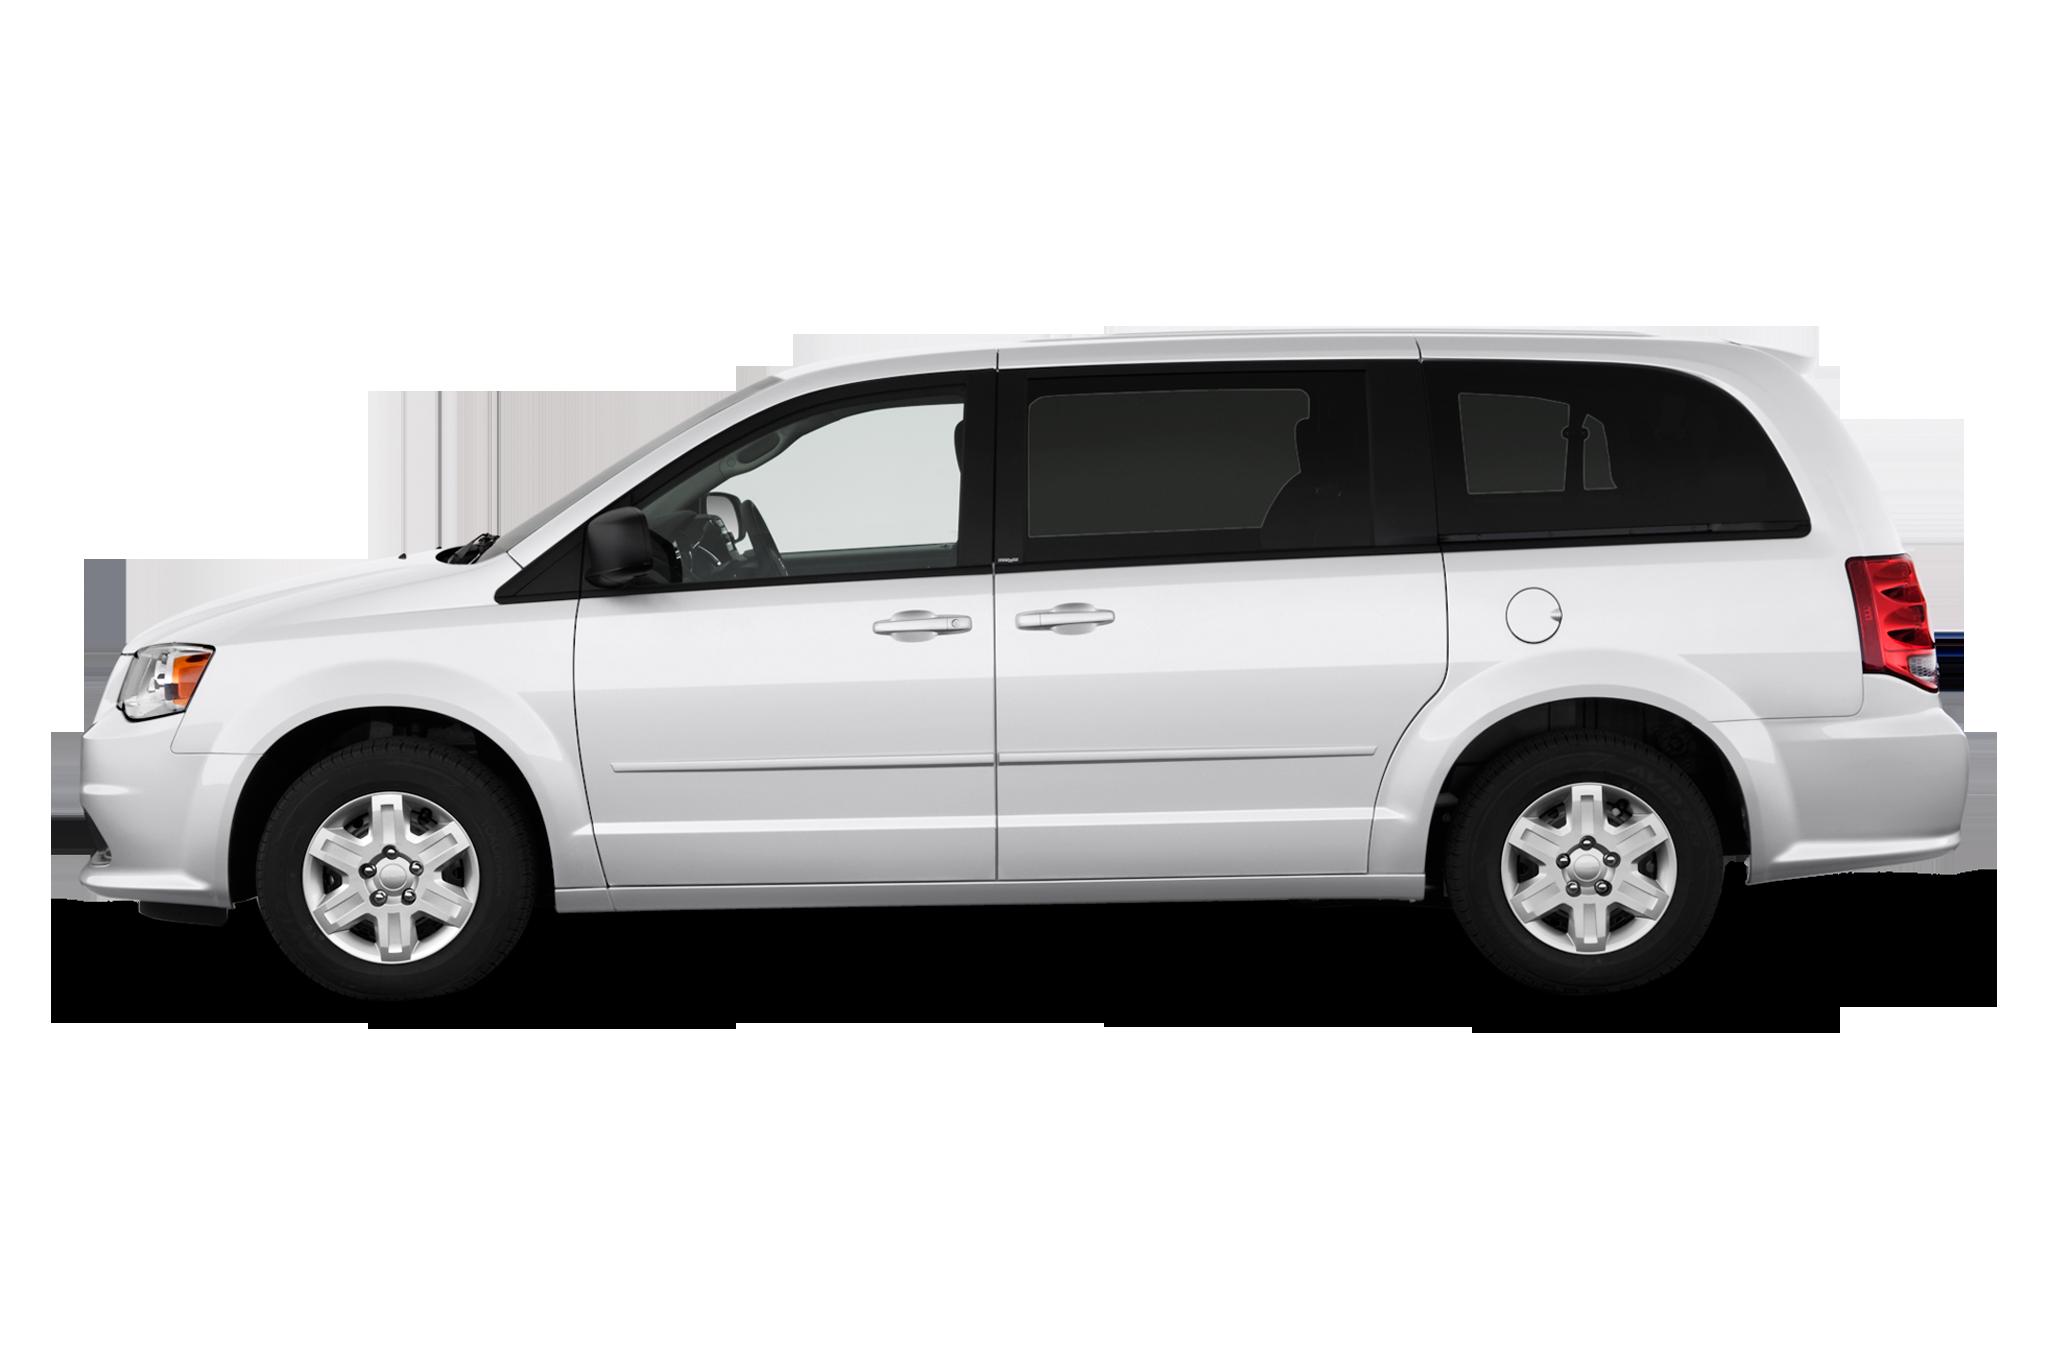 2012-dodge-grand-caravan-se-minivan-side